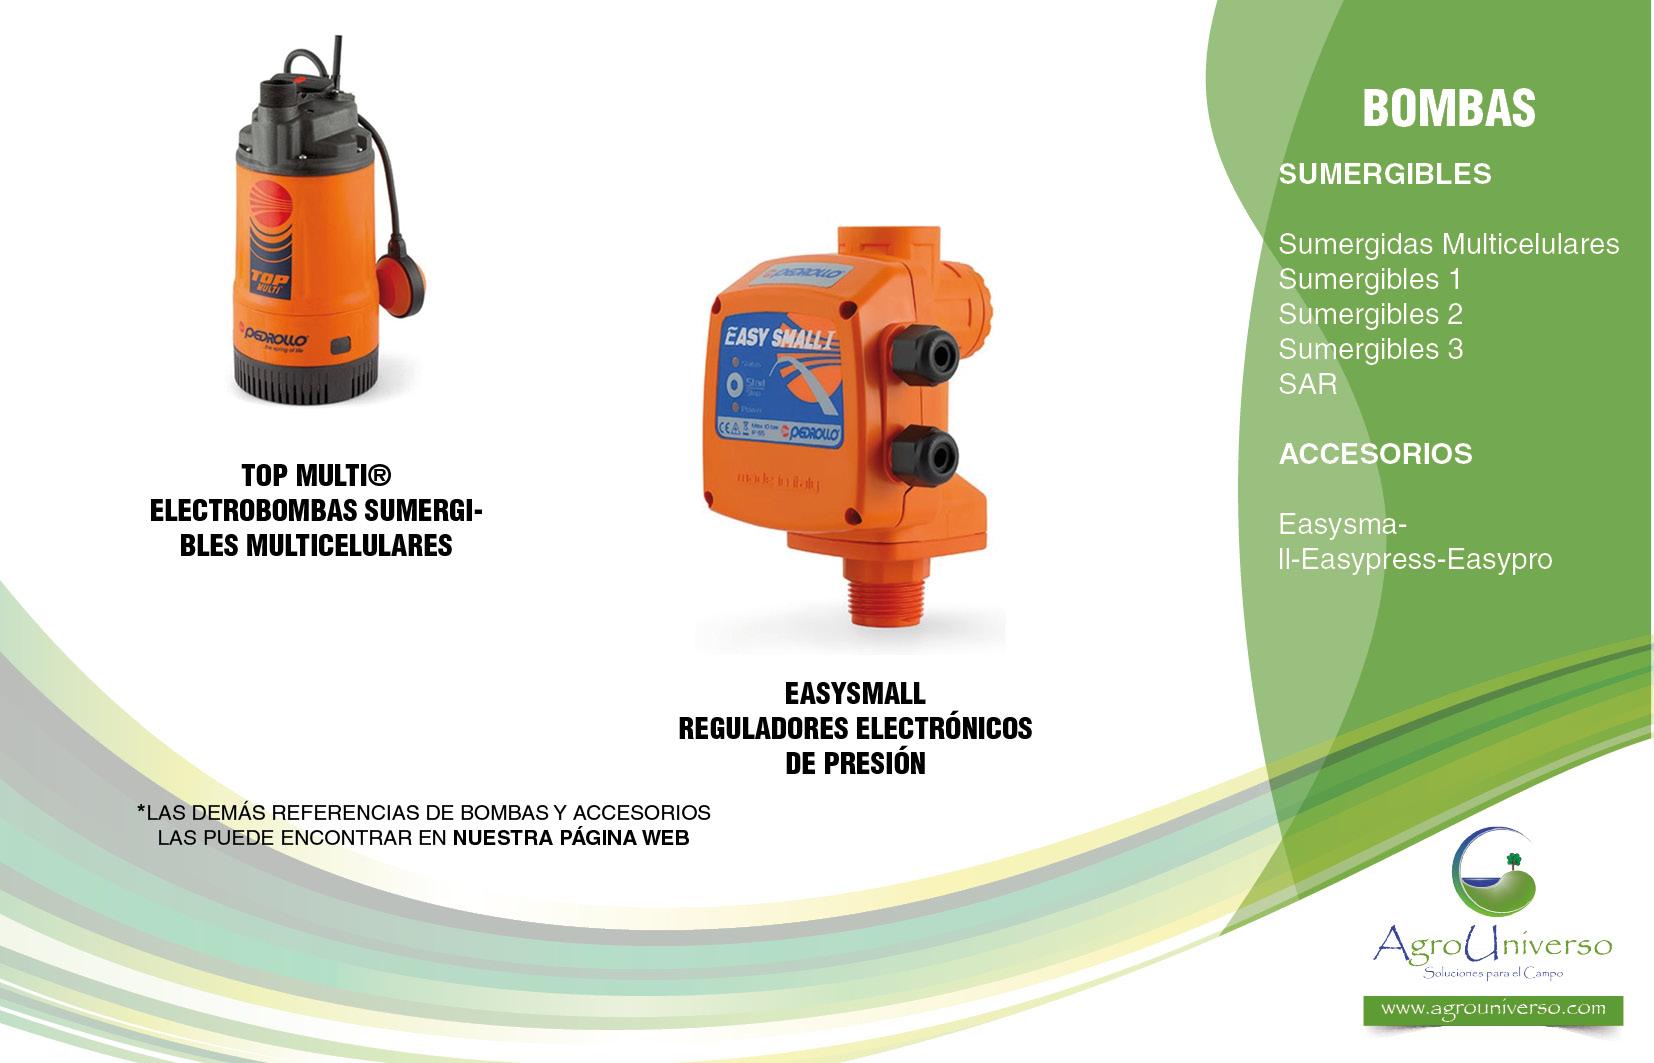 Catlogo-de-productos-Agrouniverso-31